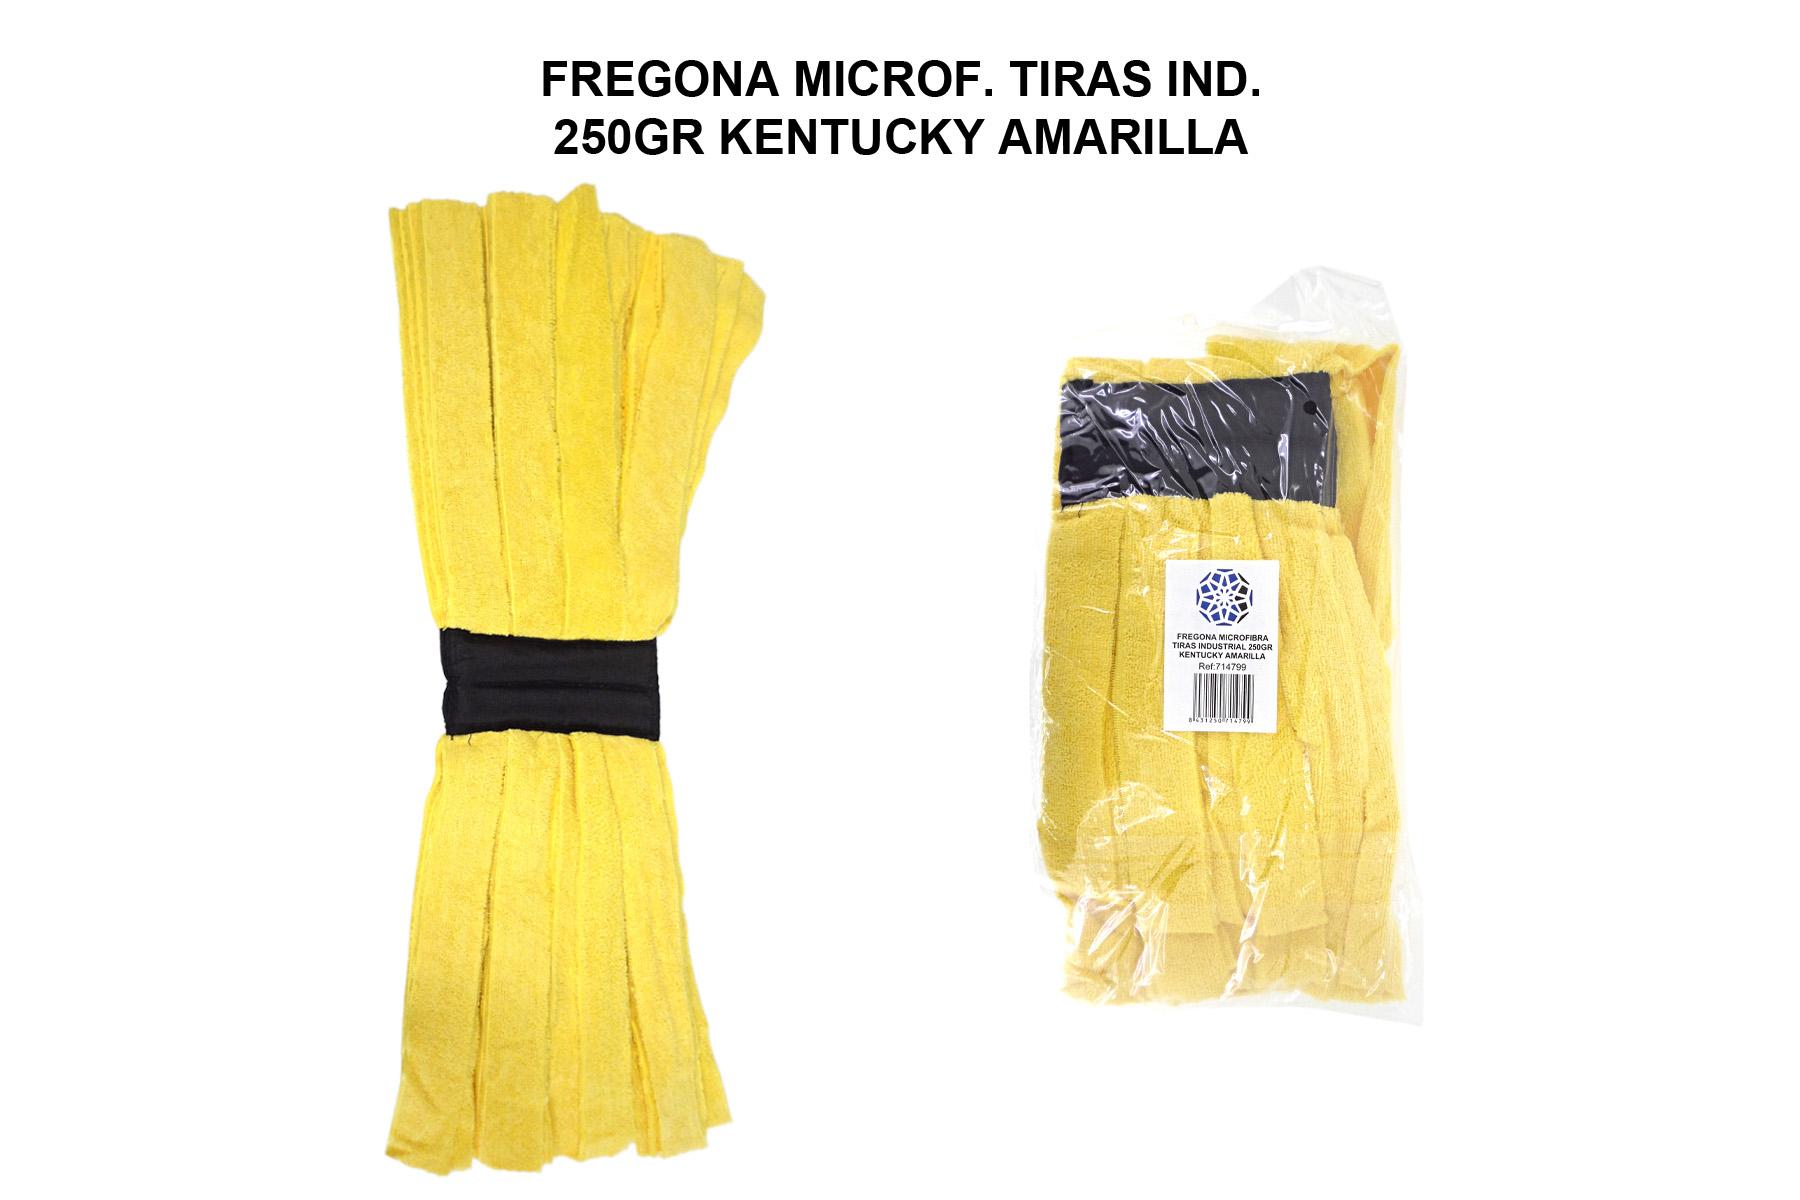 FREGONA MICROF. TIRAS IND. 250GR KENTUCKY AMARILLA